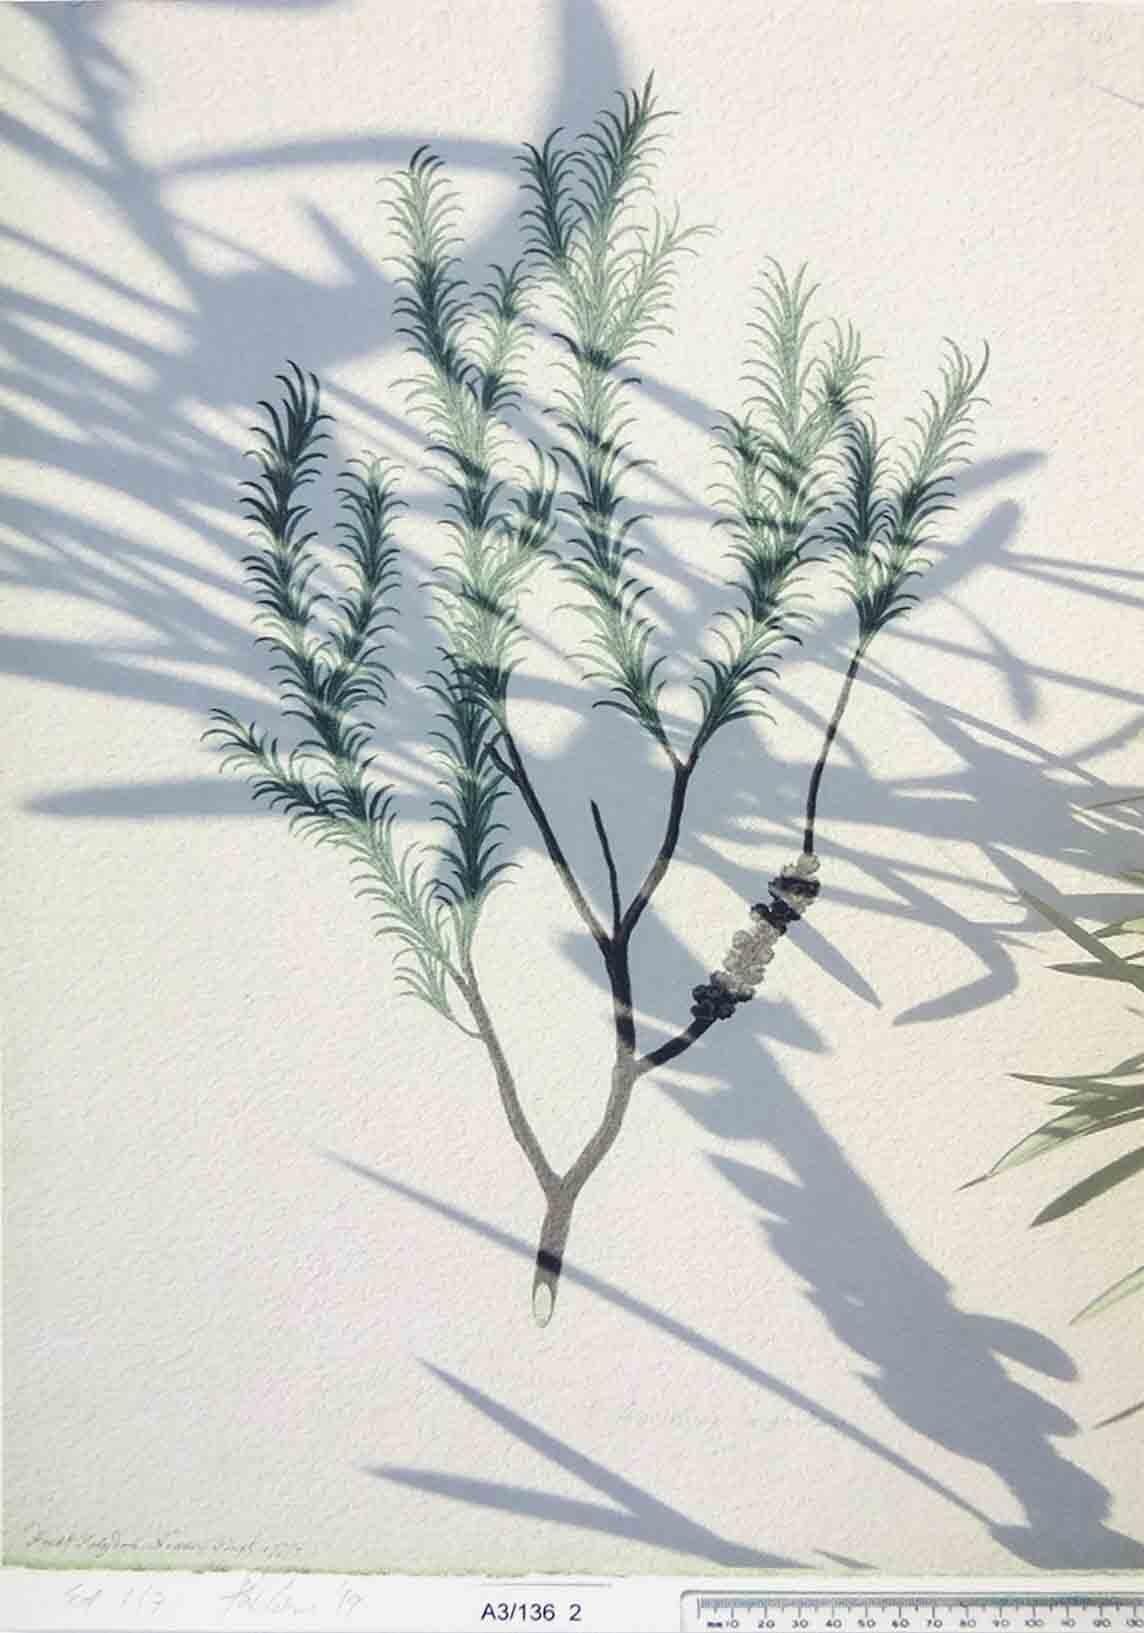 8. Penny Coss Terminus (Ode to Melaleuca armillaris), 2019 digital print on 310gsm cotton rag edition of 3 42 x 29.7 cm $230